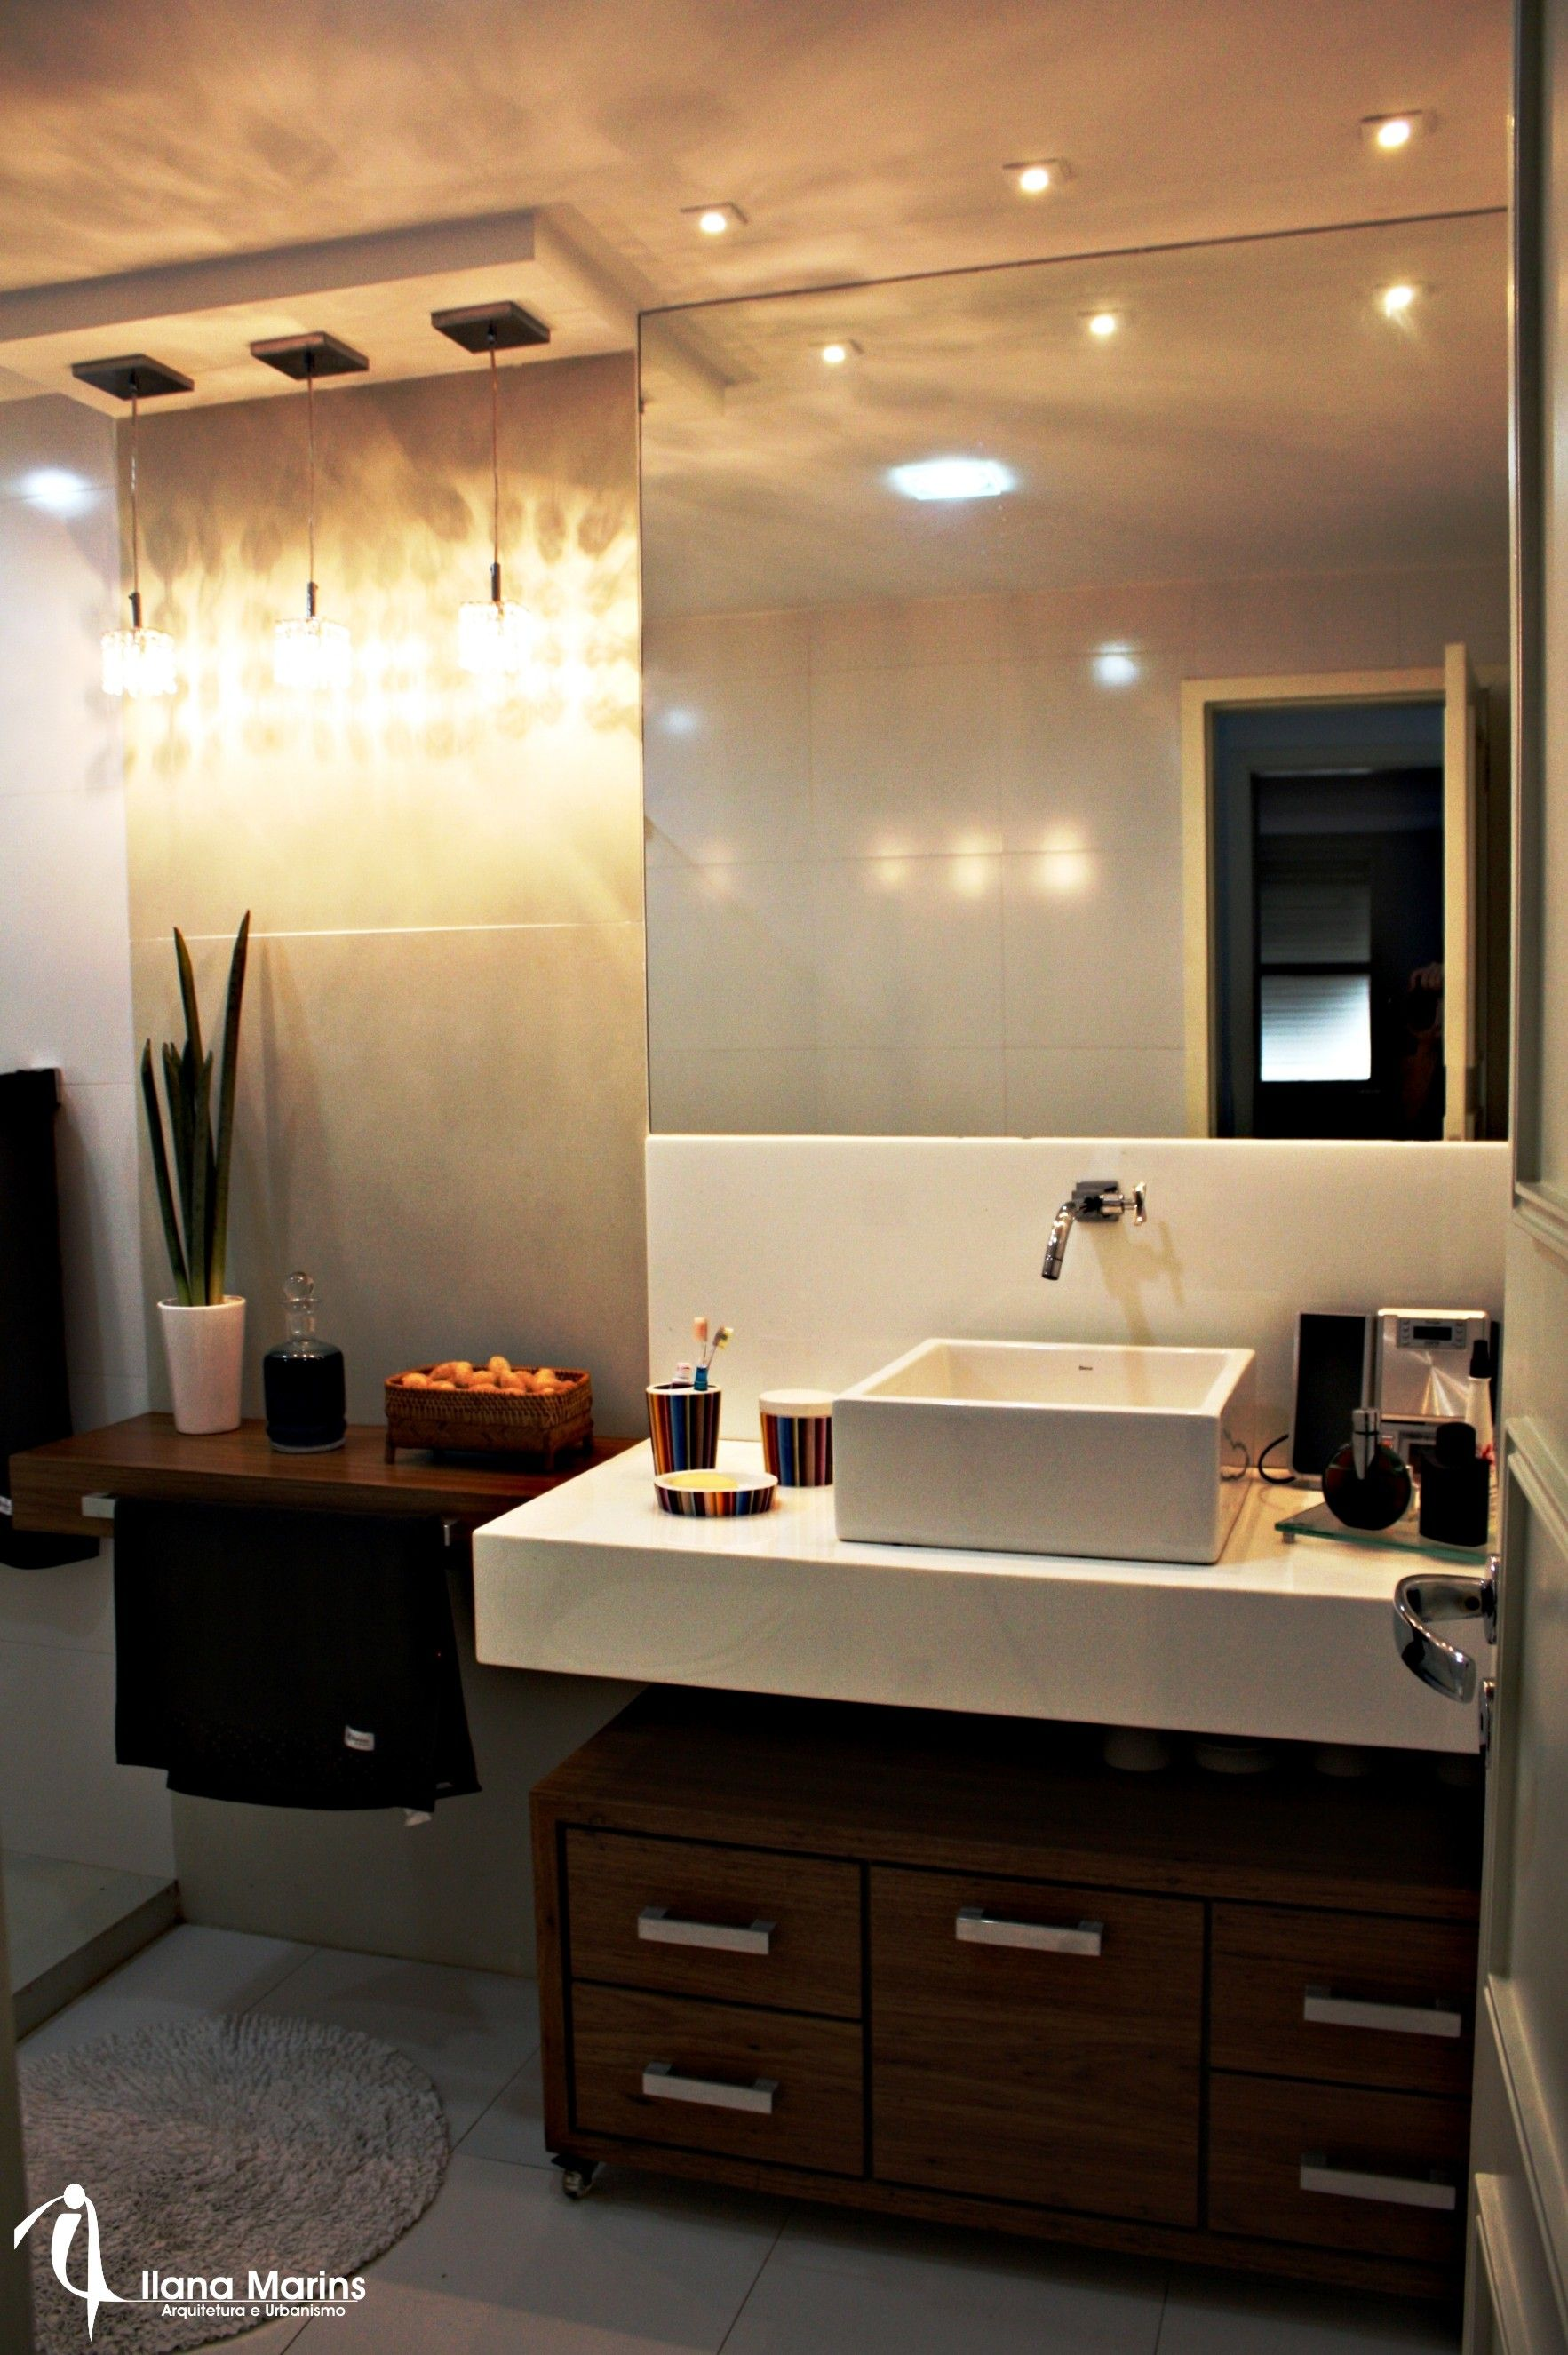 Banheiros e lavabos chiques e aconchegantes  Blog da Michelle Mayrink  Bath -> Armario Banheiro Chique